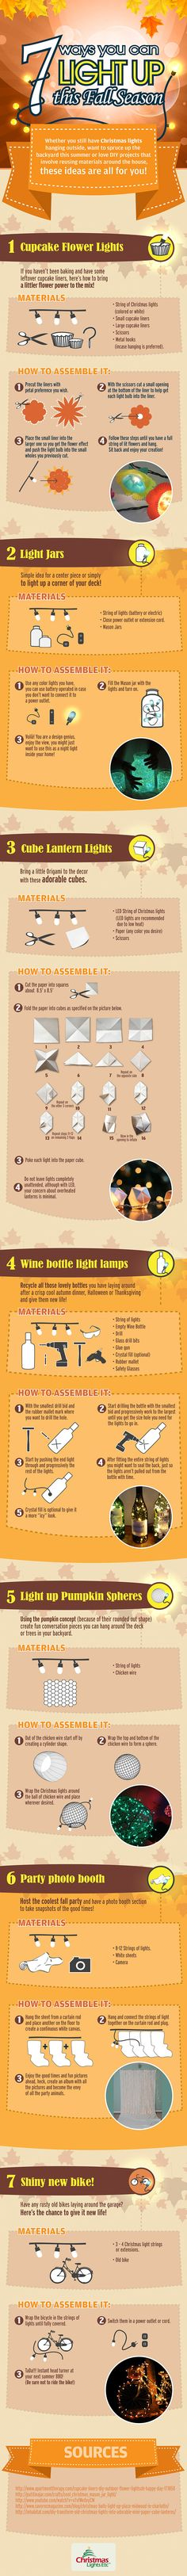 7 Ways to LIGHT UP this Fall Season